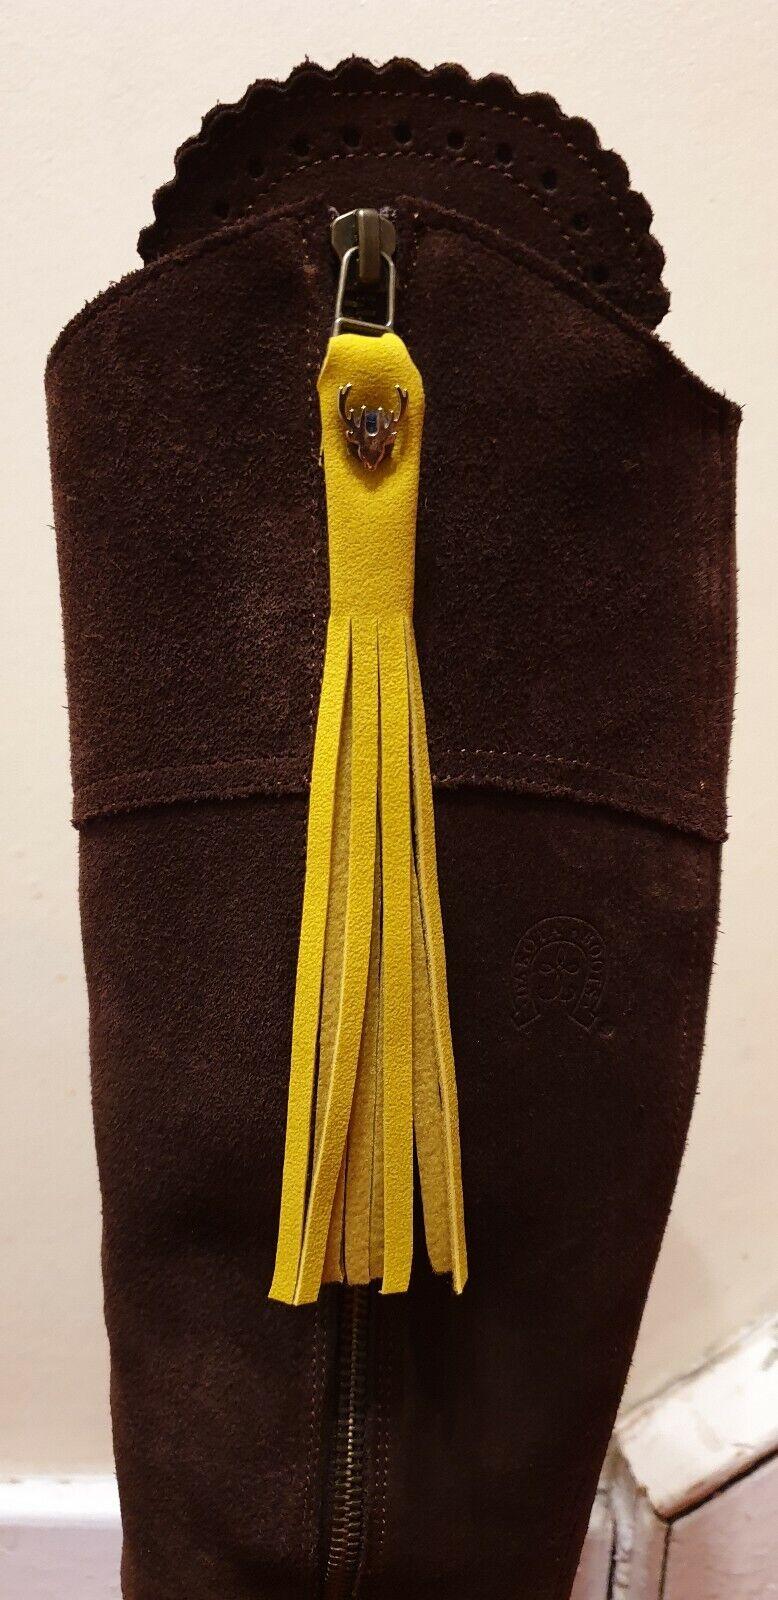 Boot Tassels will fit Fairfax Favor spanish riding boots